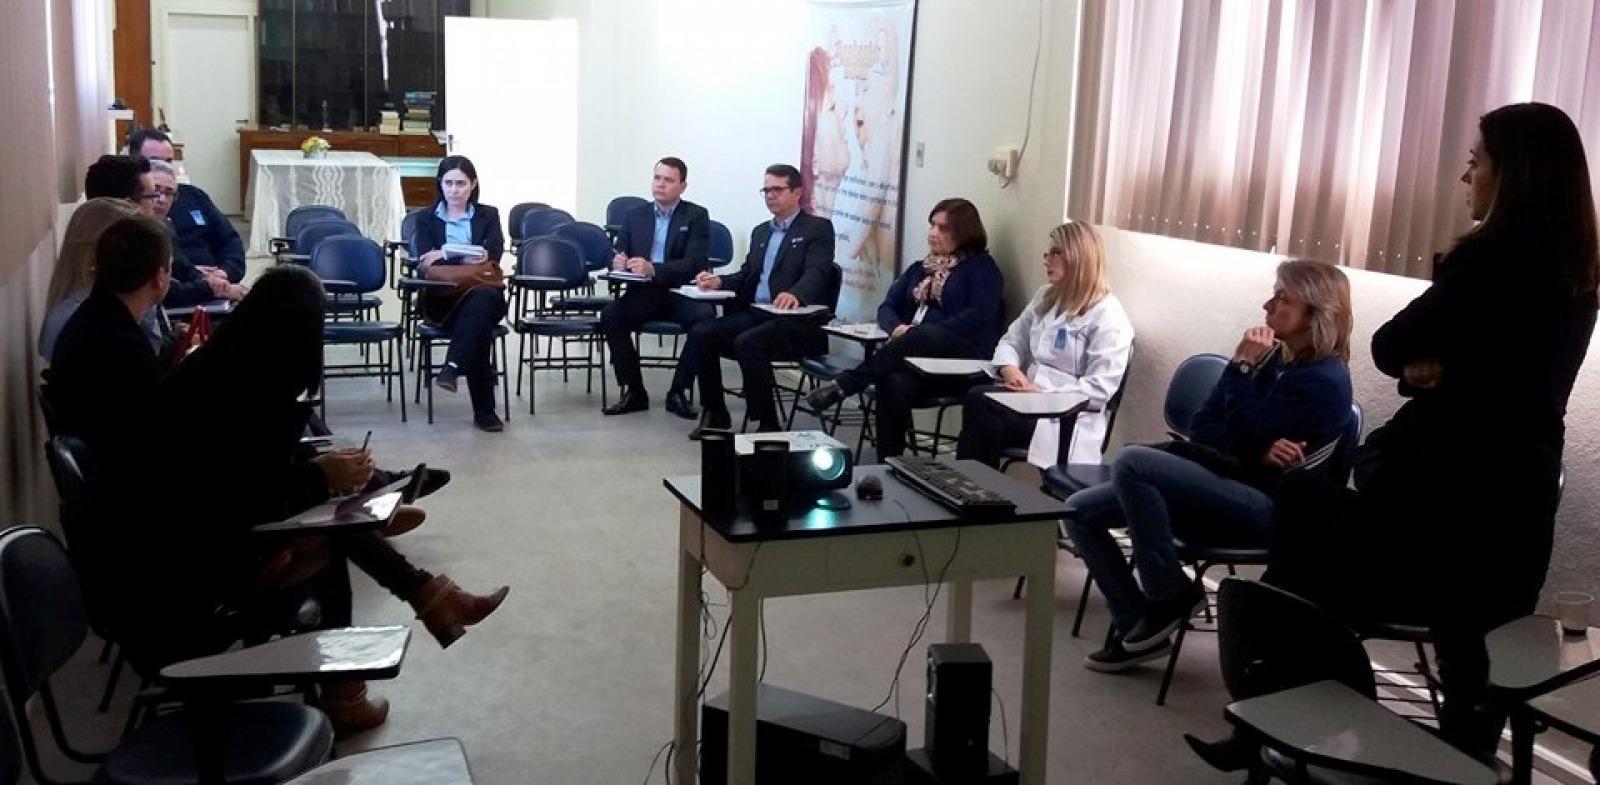 Visita Técnica - Hospital Ivan Goulart/São Borja